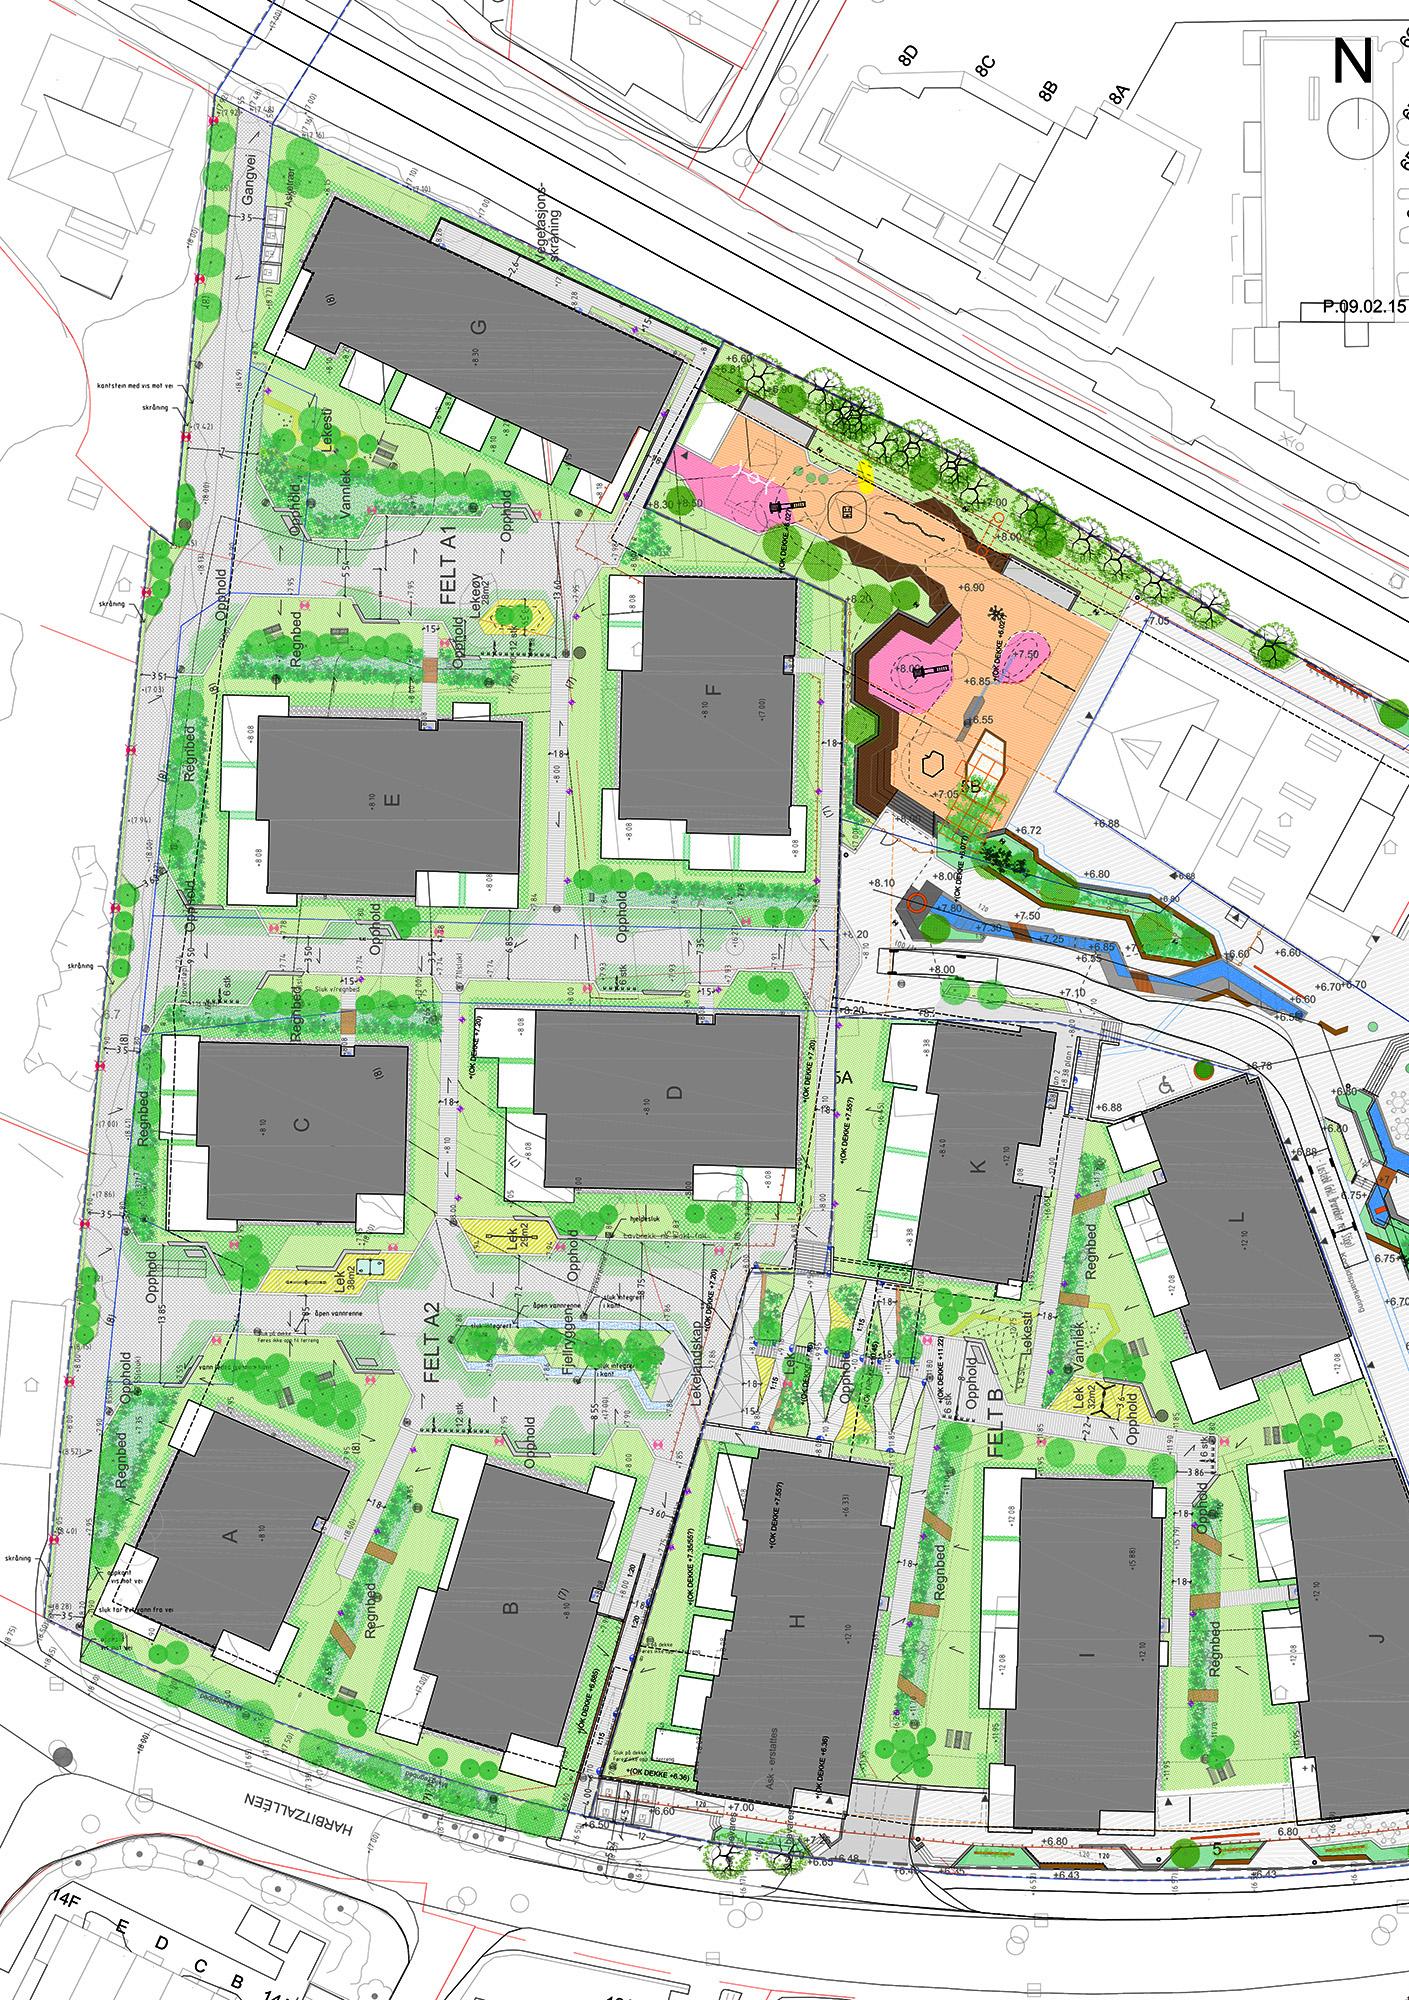 Landscape plan by Grindaker as Landskapsarkitekter